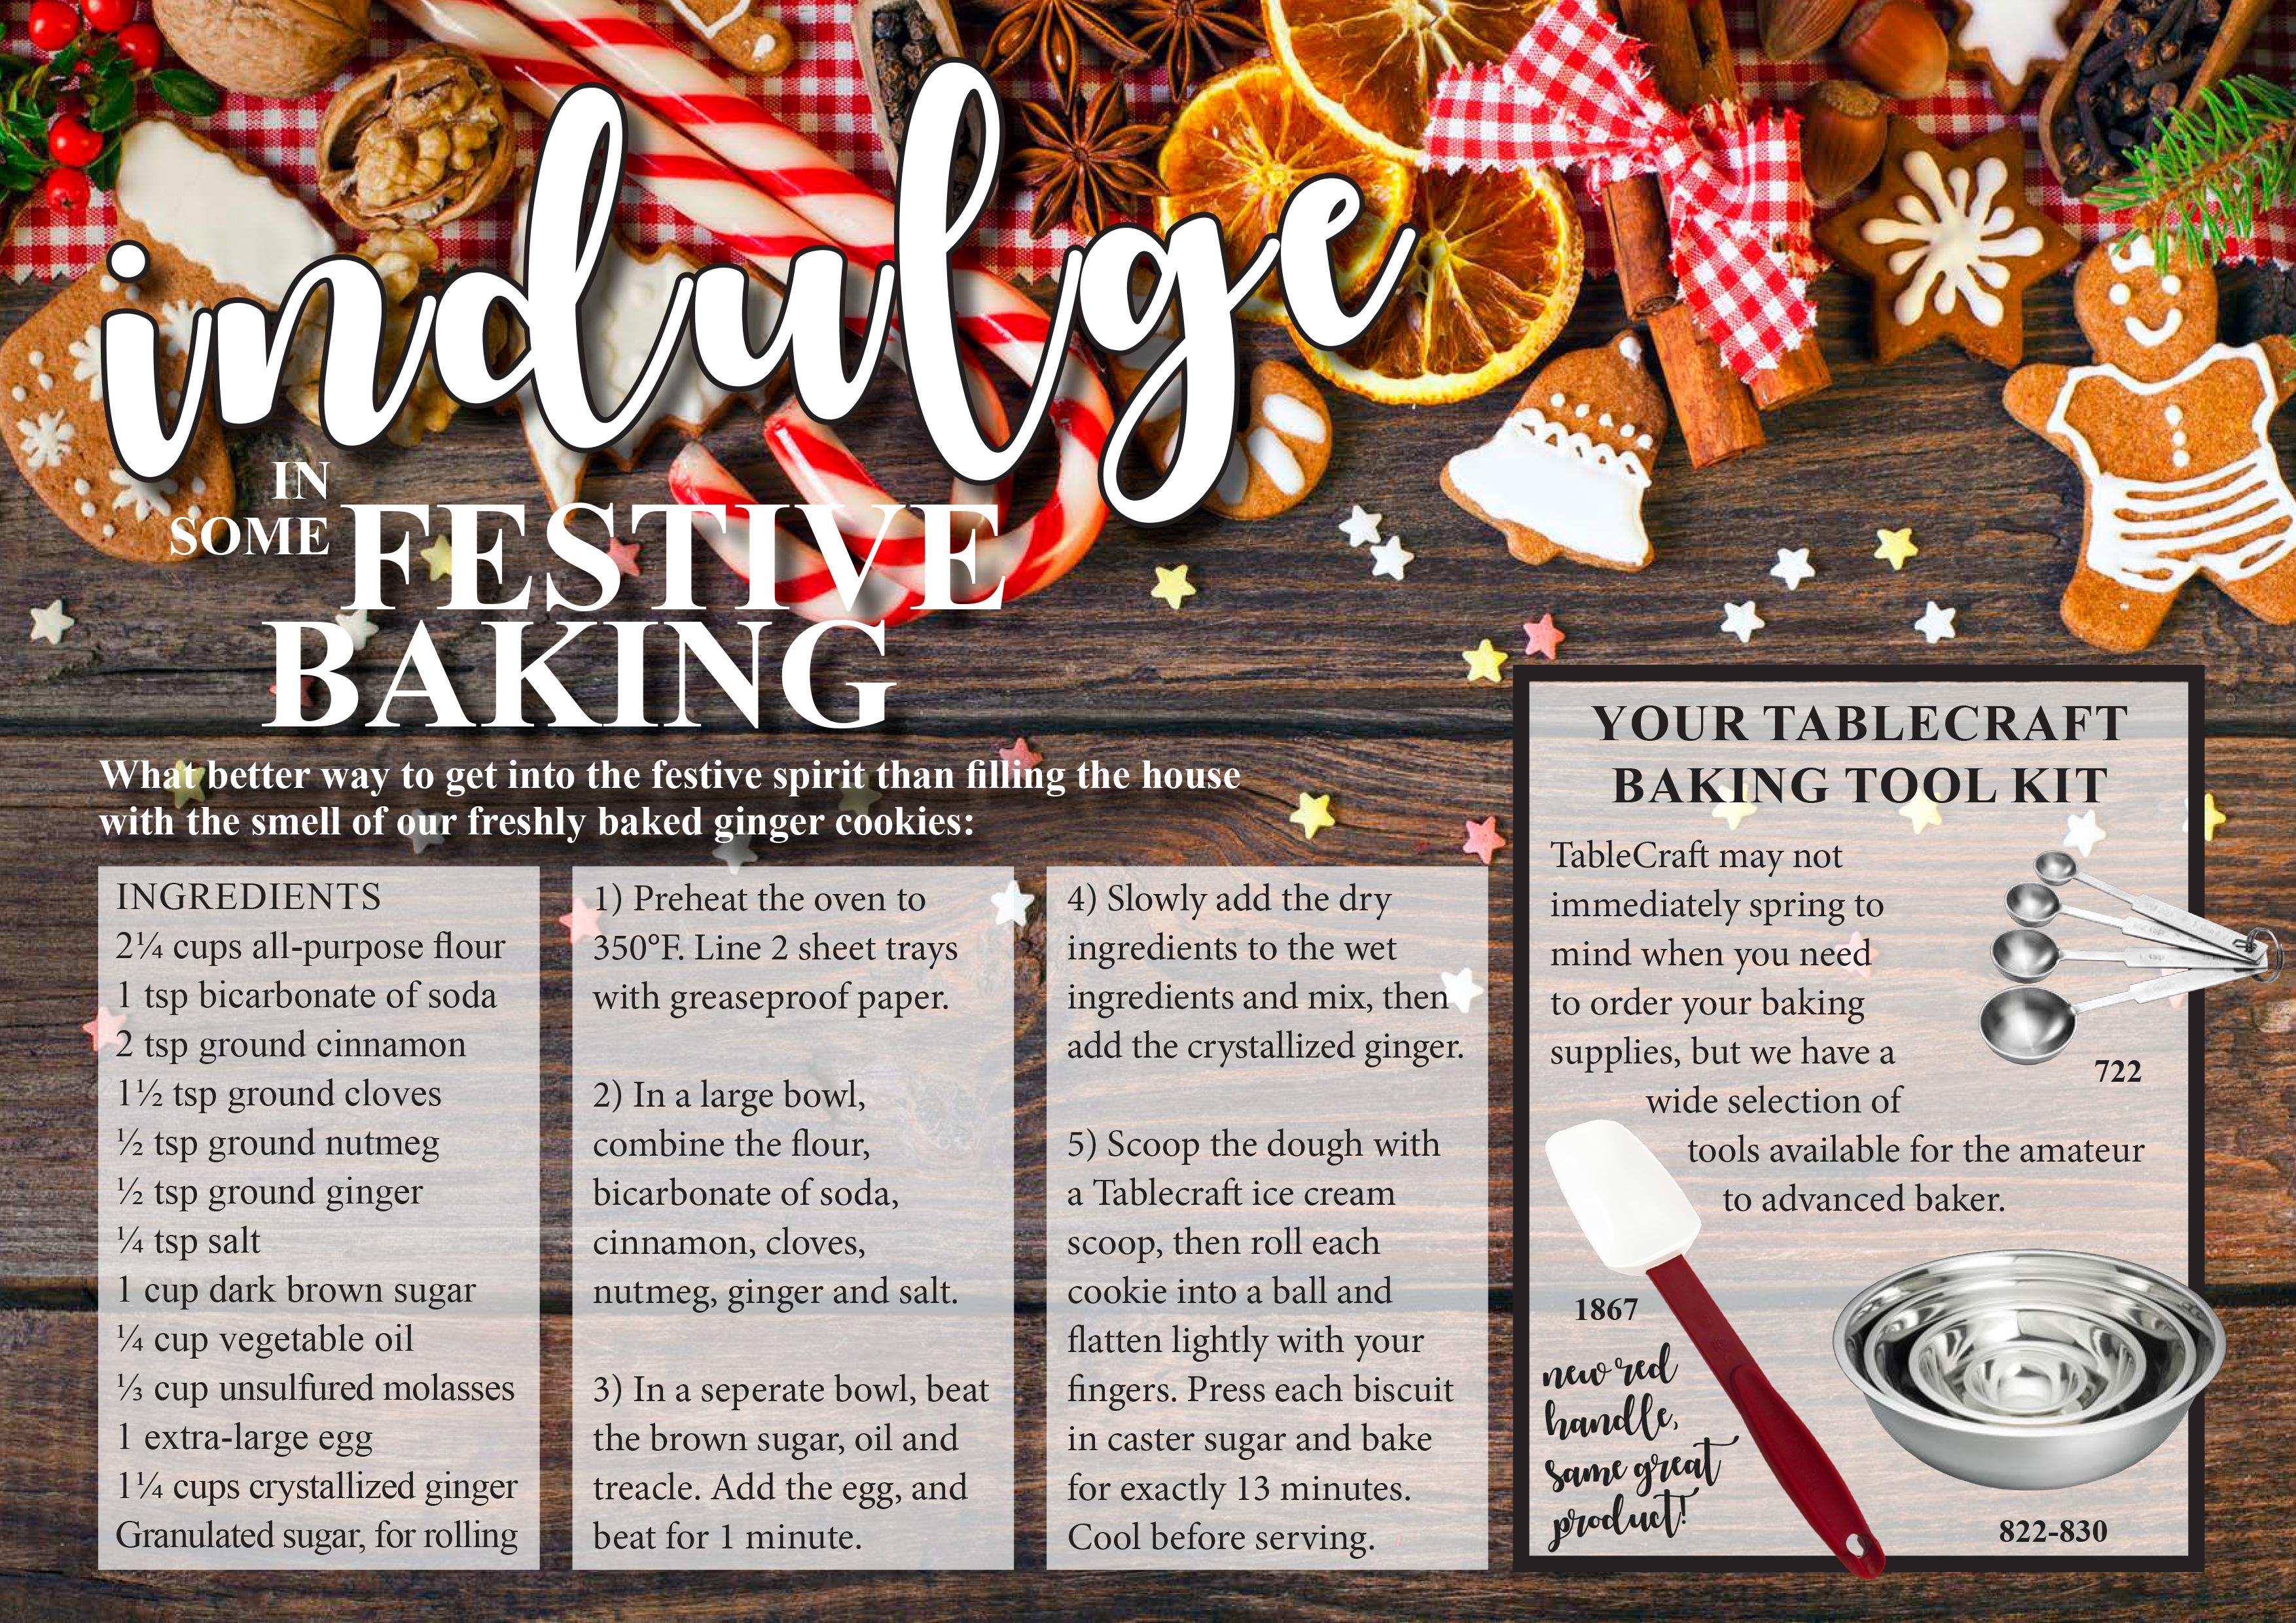 indulge in some festive baking